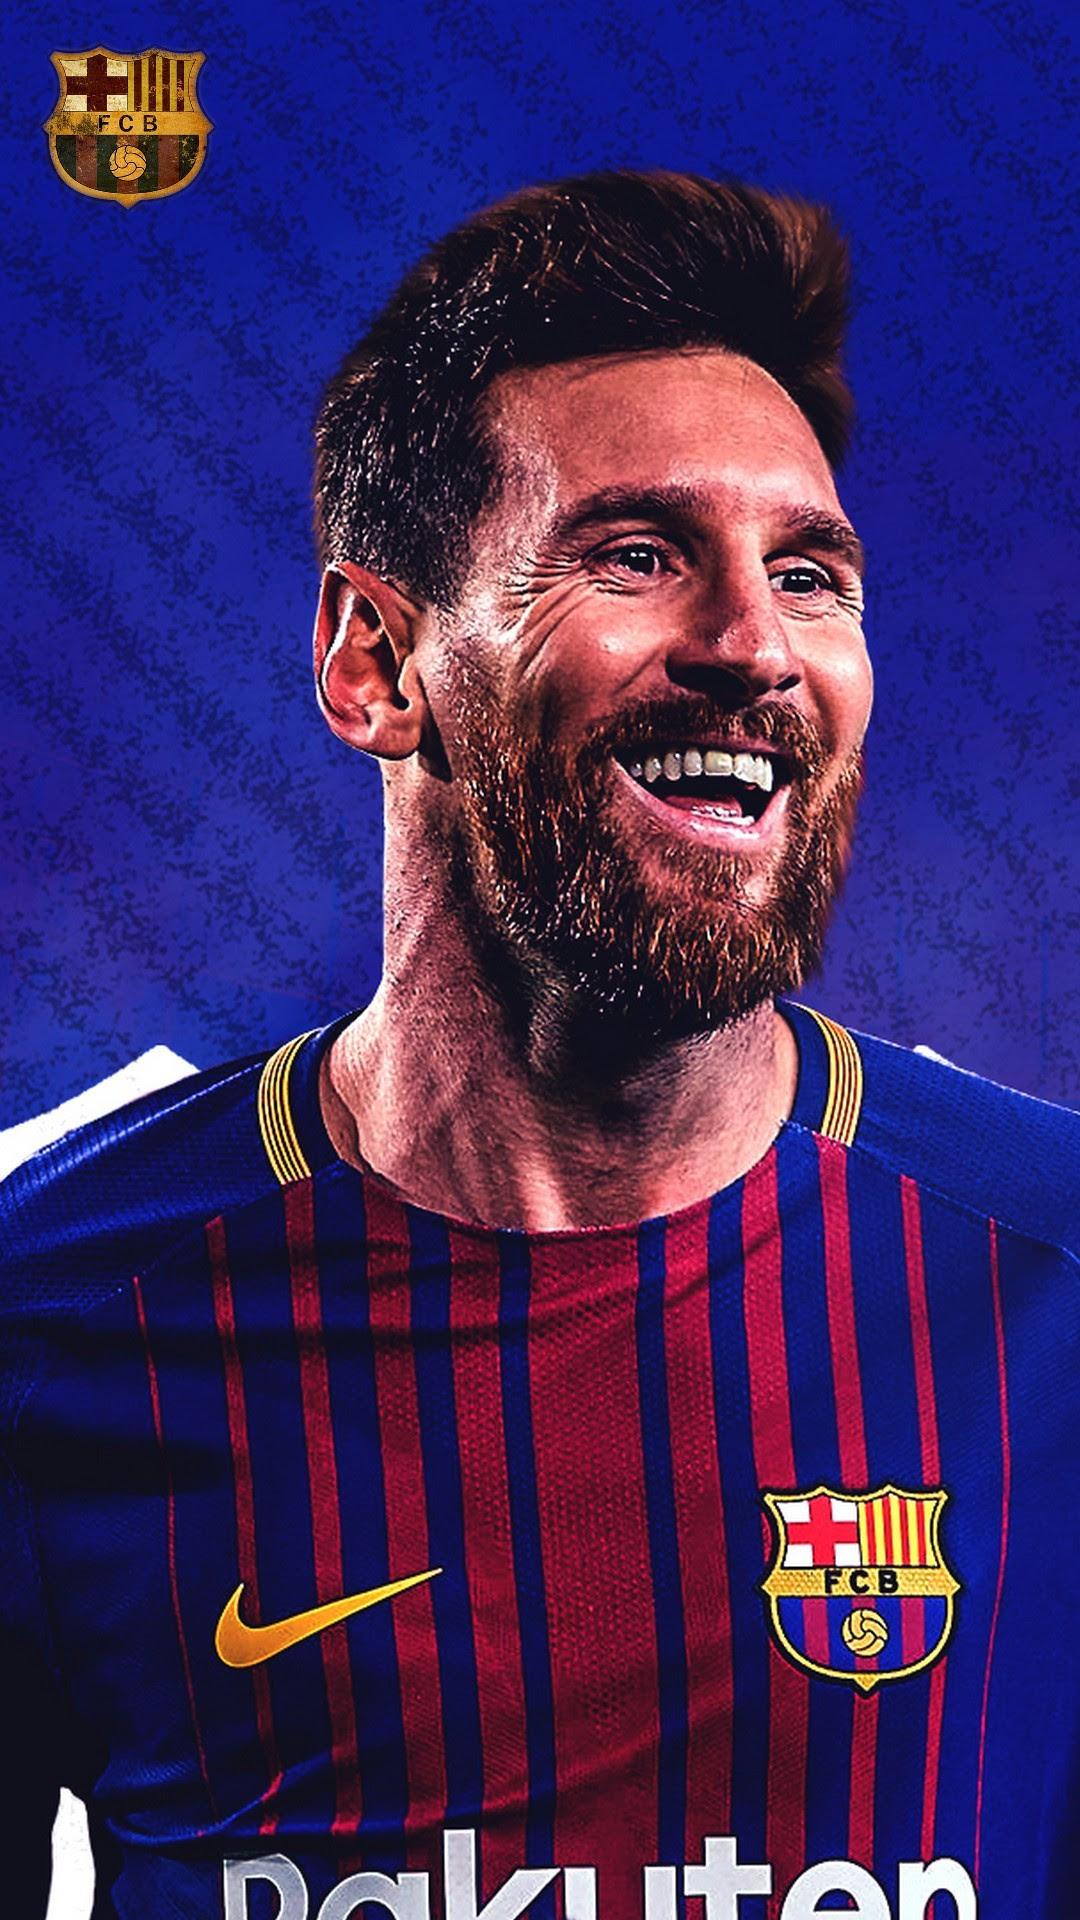 Messi Wallpaper Iphone 2019